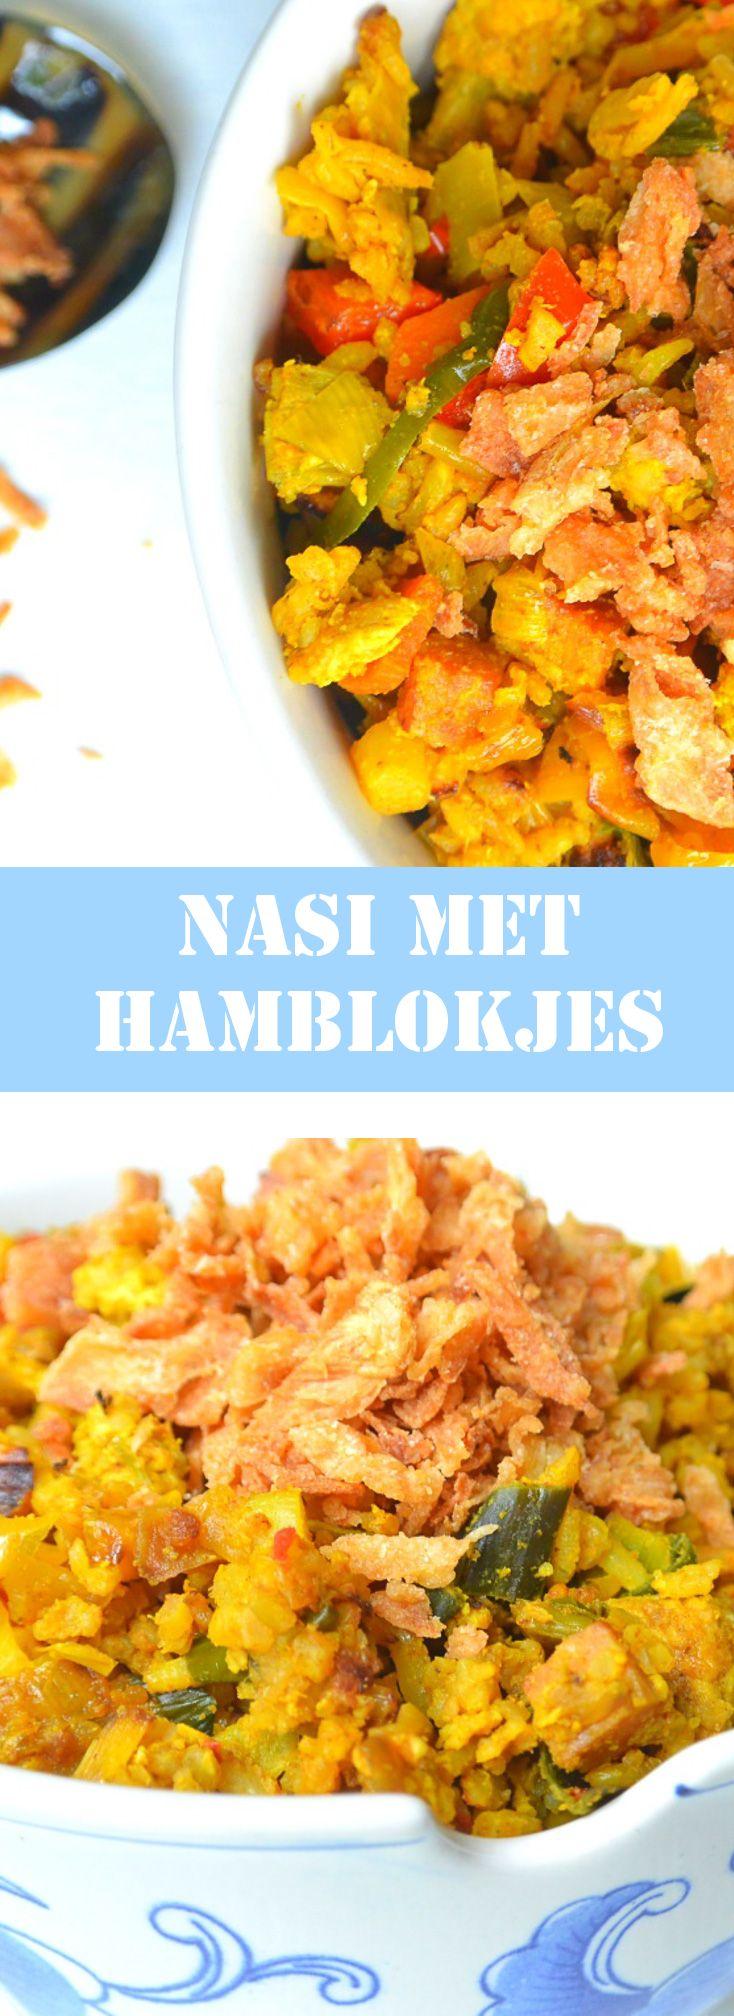 Nasi met hamblokjes